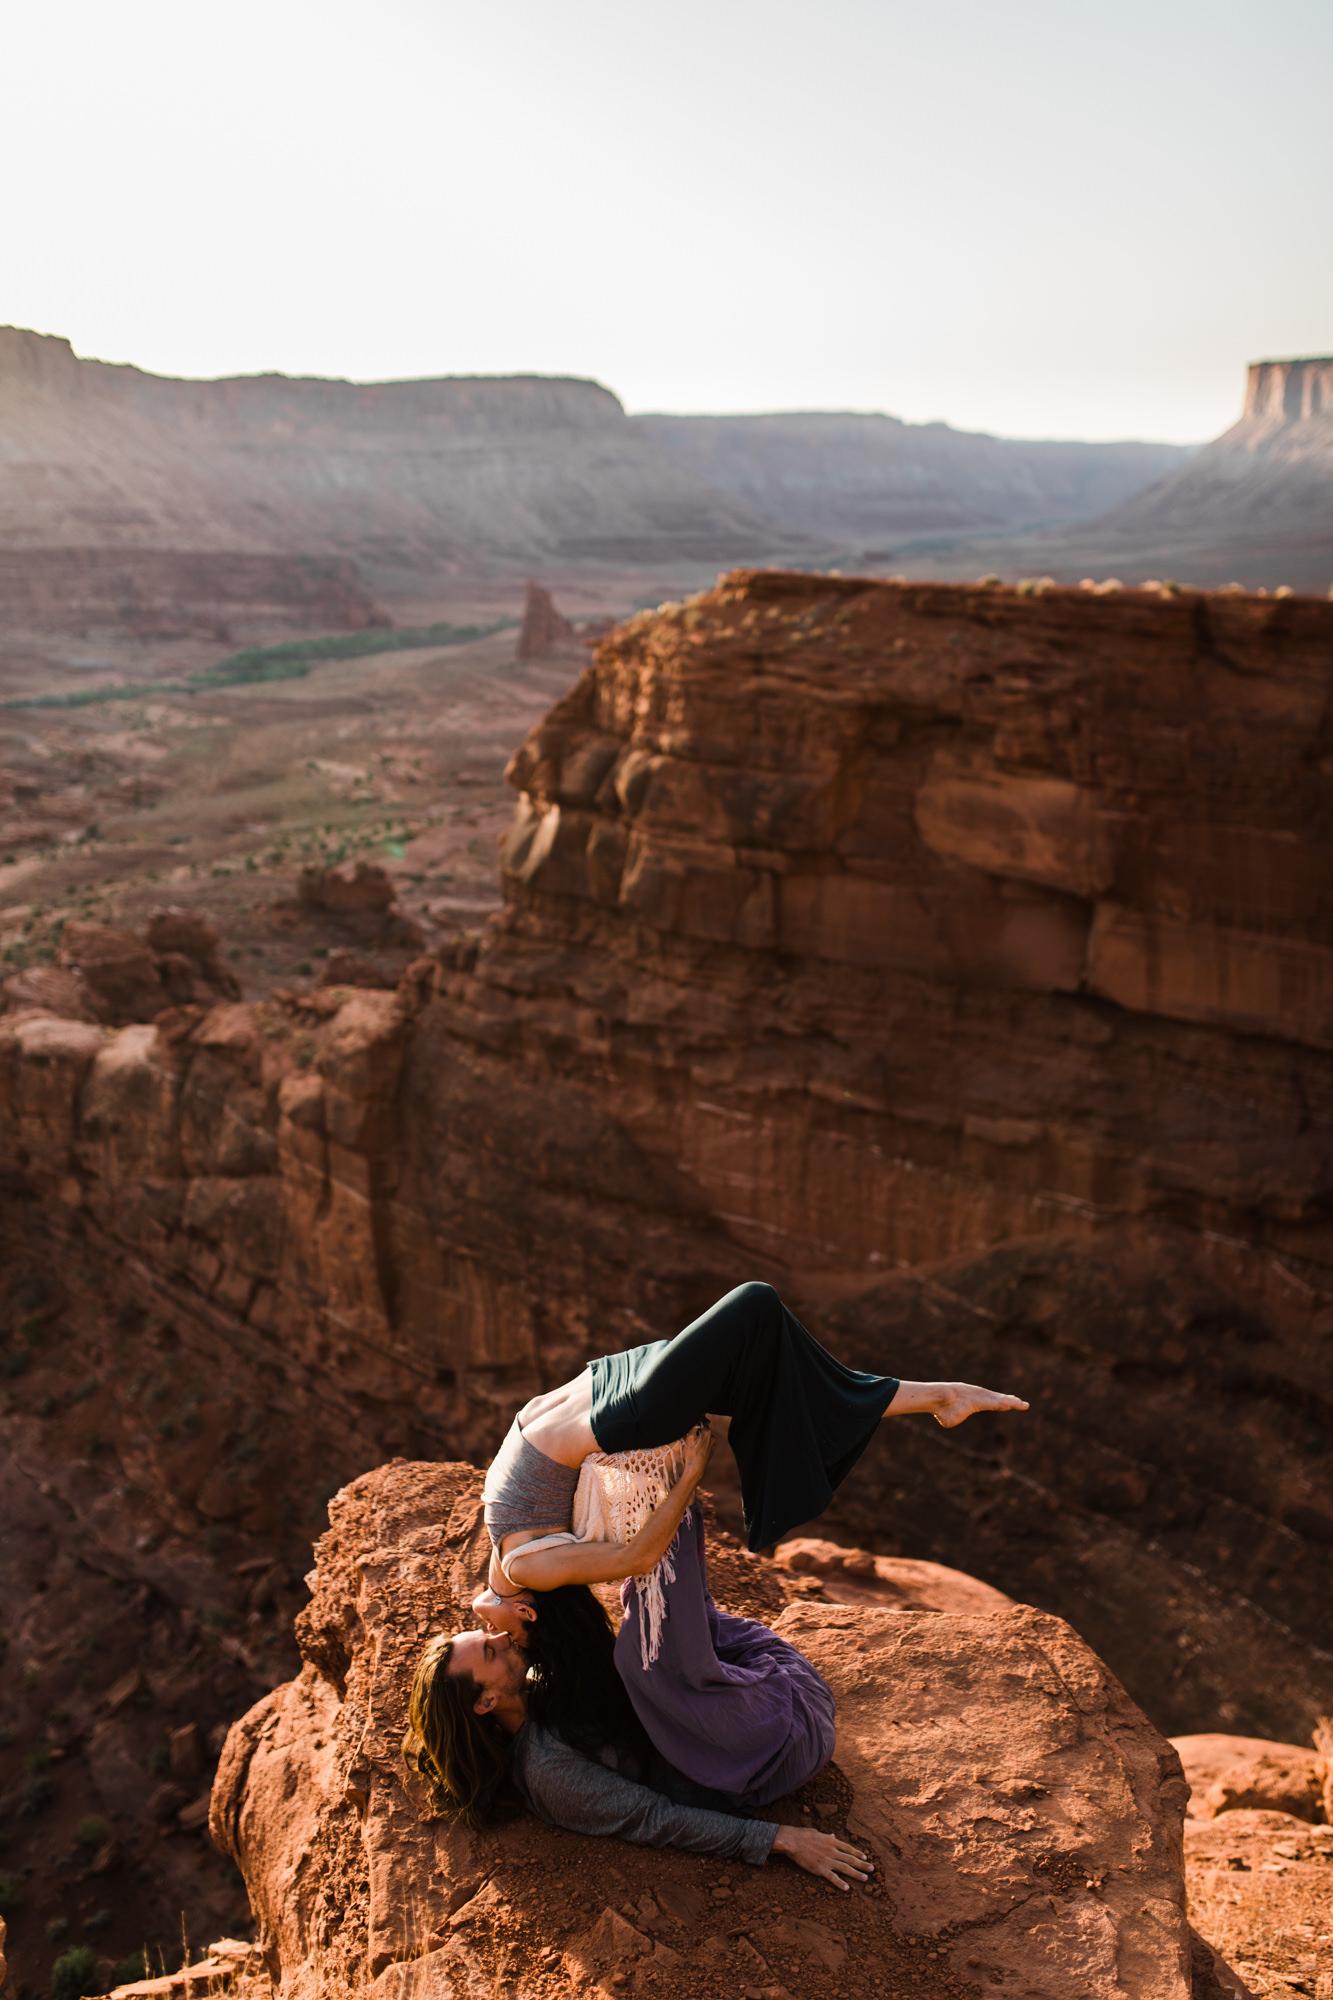 epic acro yoga engagements in moab, utah | destination engagement photo inspiration | utah adventure elopement photographers | the hearnes adventure photography | www.thehearnes.com